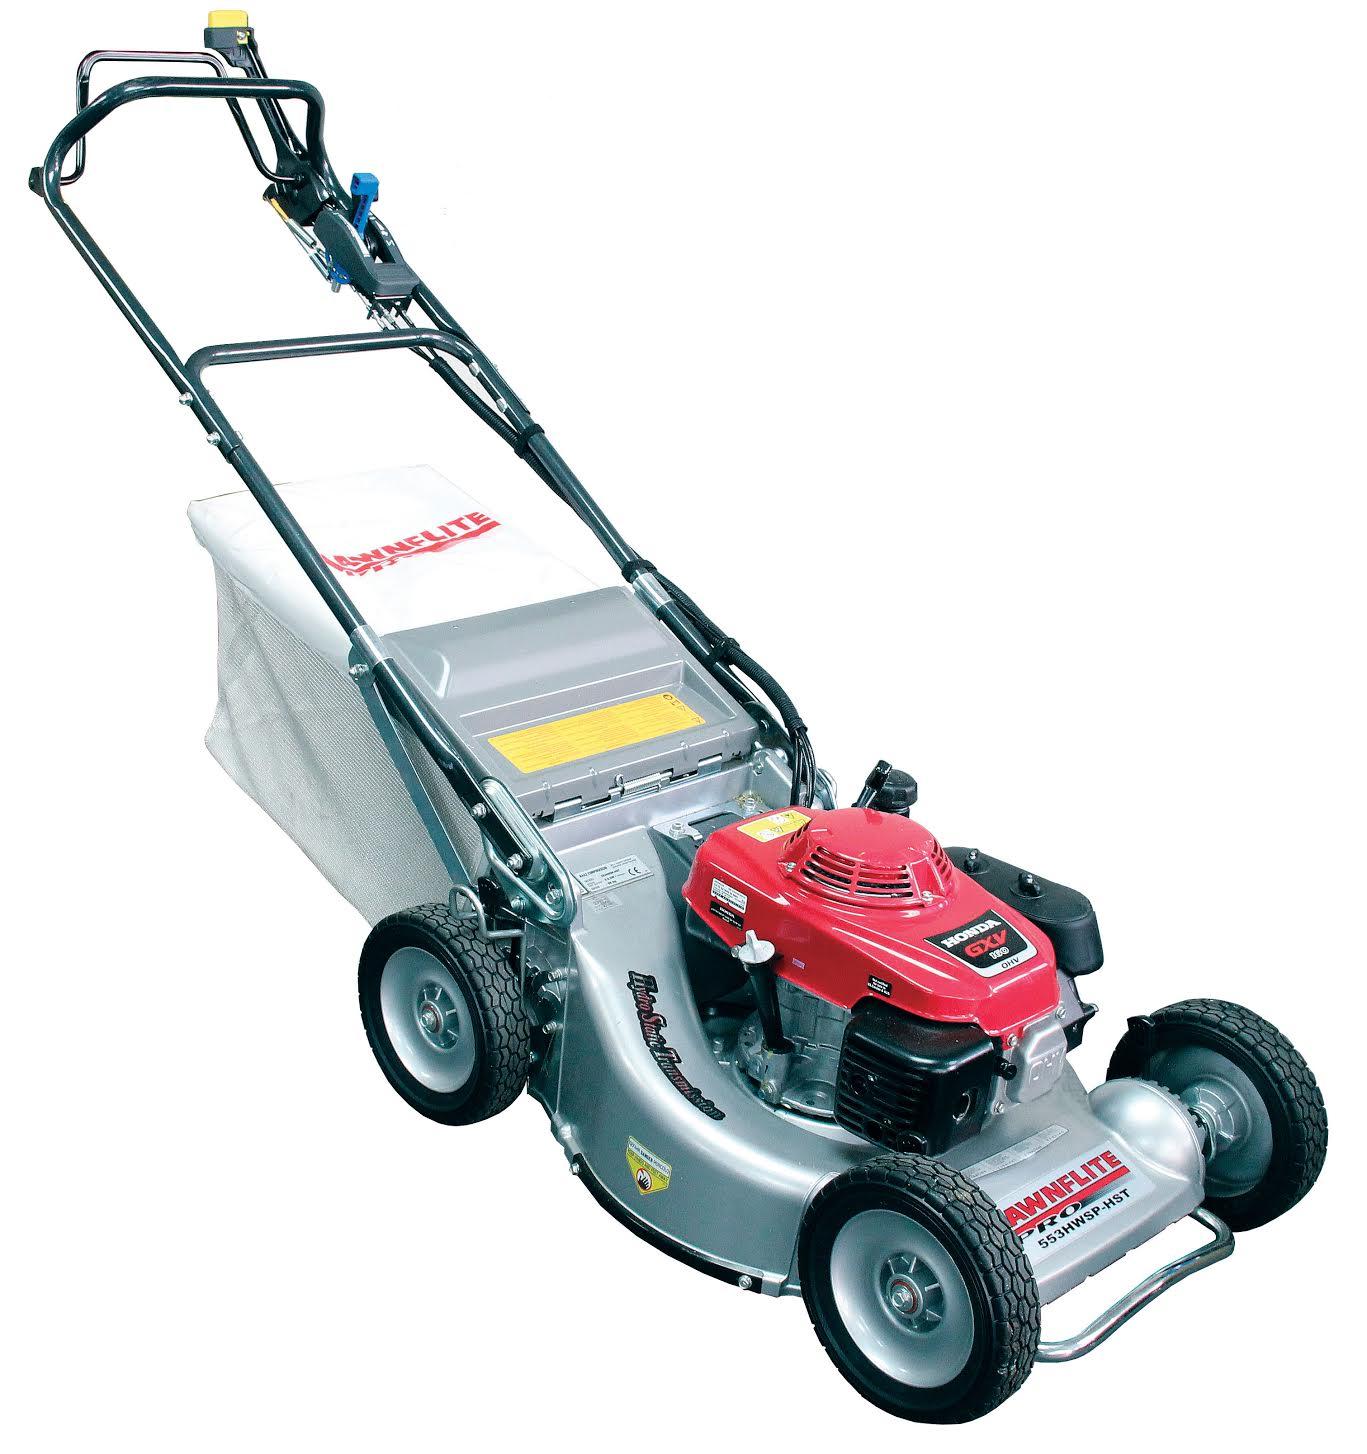 Lawnflite Pro 553hwsp Hst Four Wheel Lawn Mower With